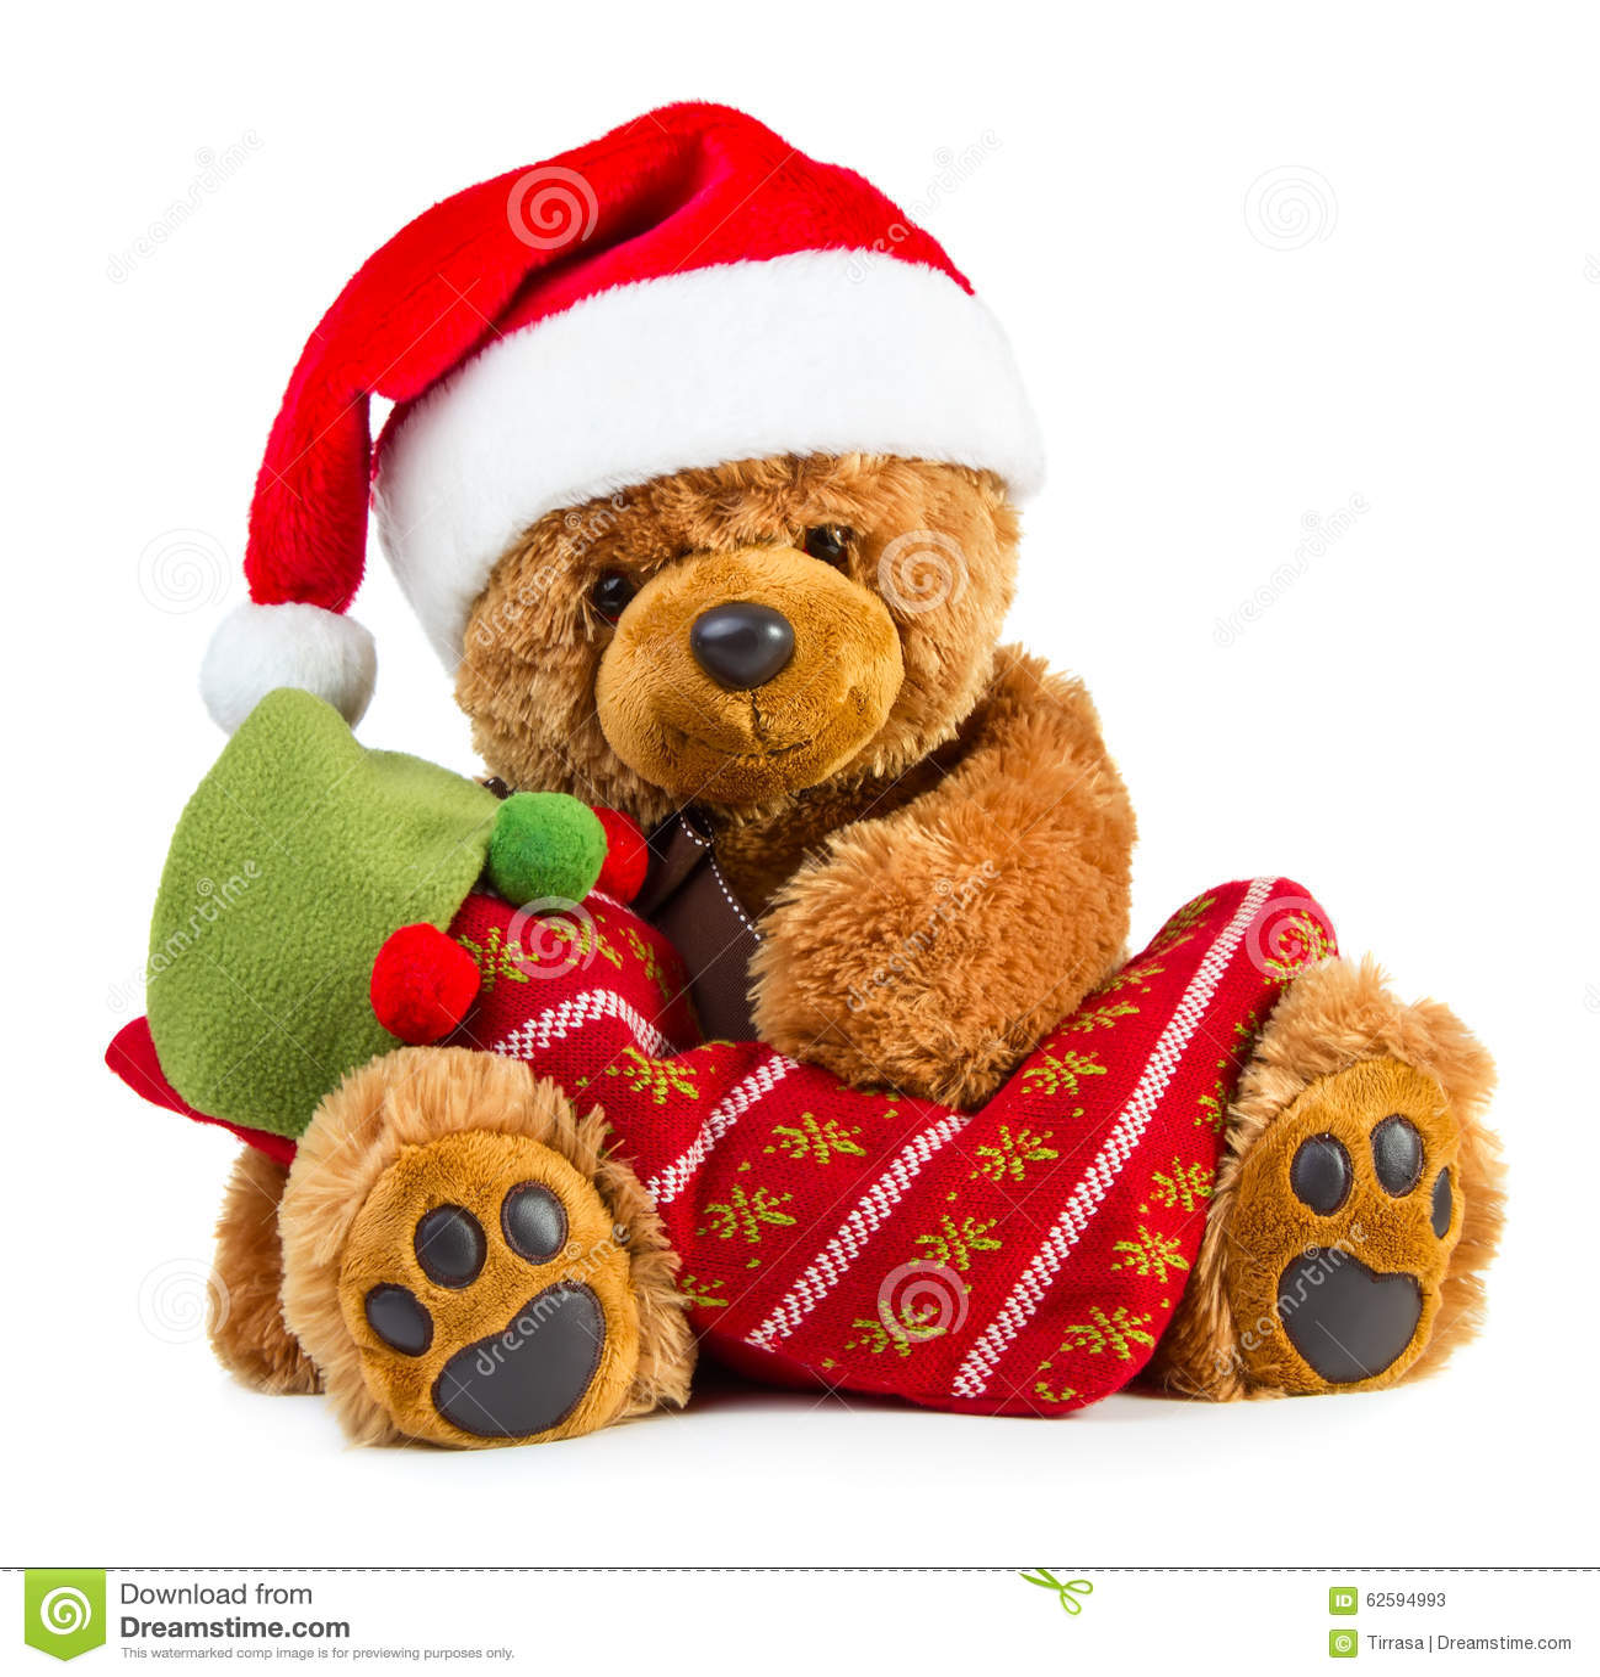 b3c609aa2aca3 Teddy Bear Wearing A Santa Hat Stock Image - Image of gift